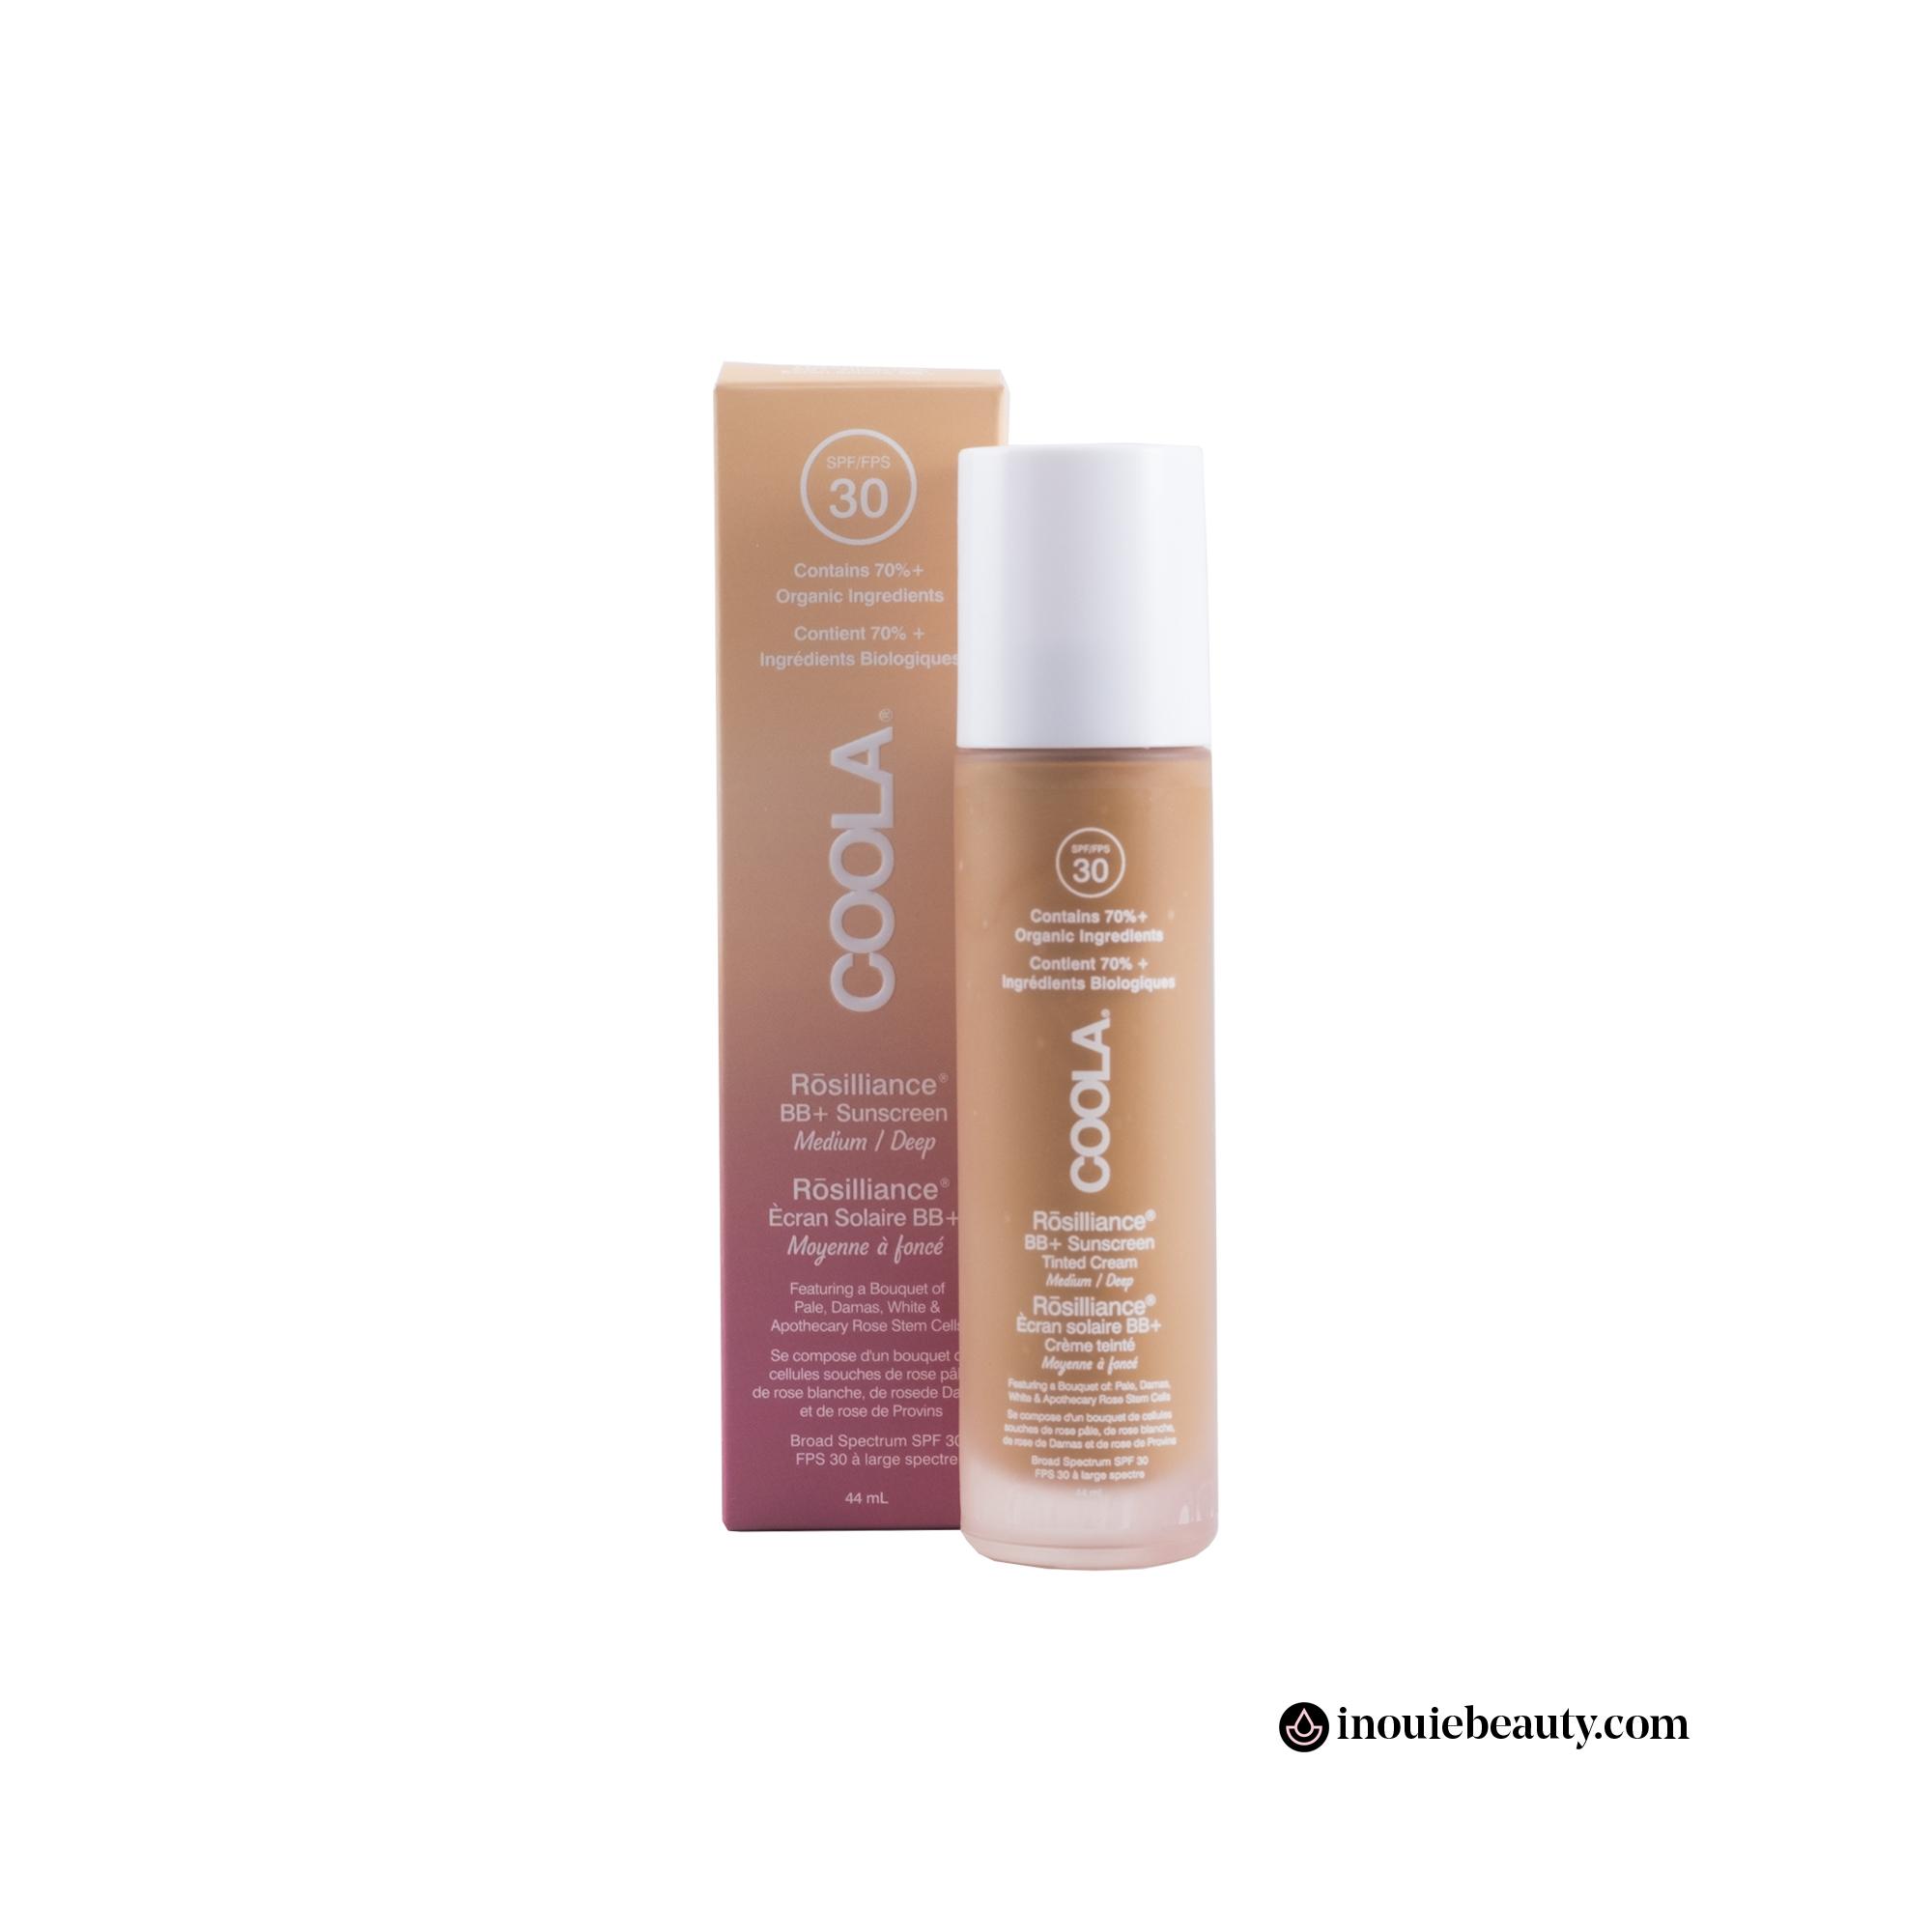 Coola Mineral Face SPF 30 Rosilliance BB+ Cream - Medium/Deep